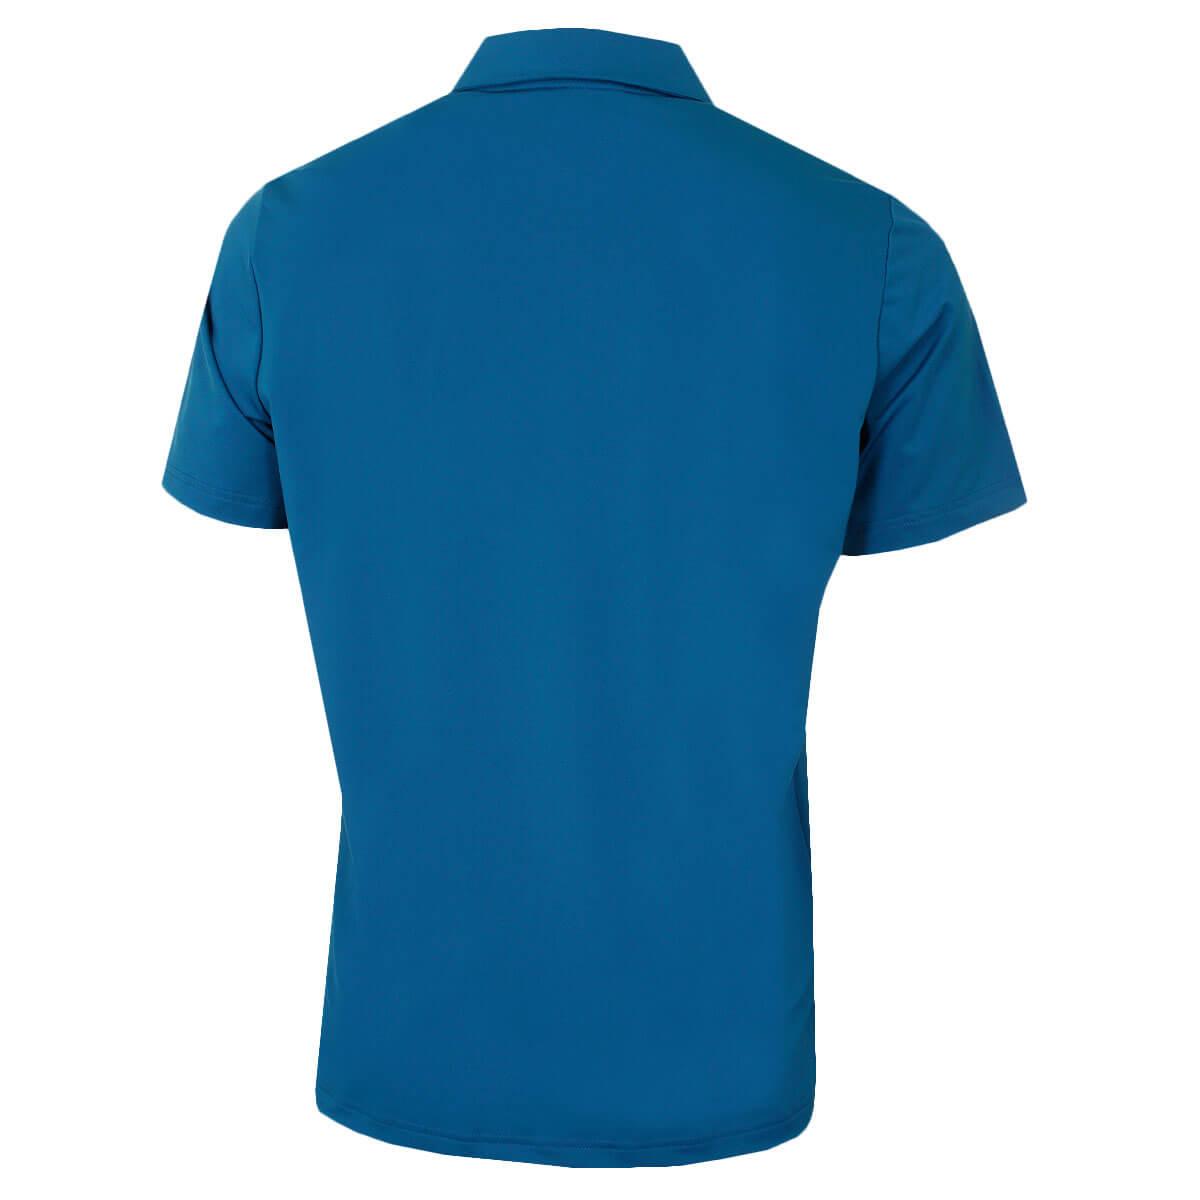 Adidas-Golf-Men-039-s-Ultimate-2-0-Solid-Crestable-Polo-Shirt thumbnail 21